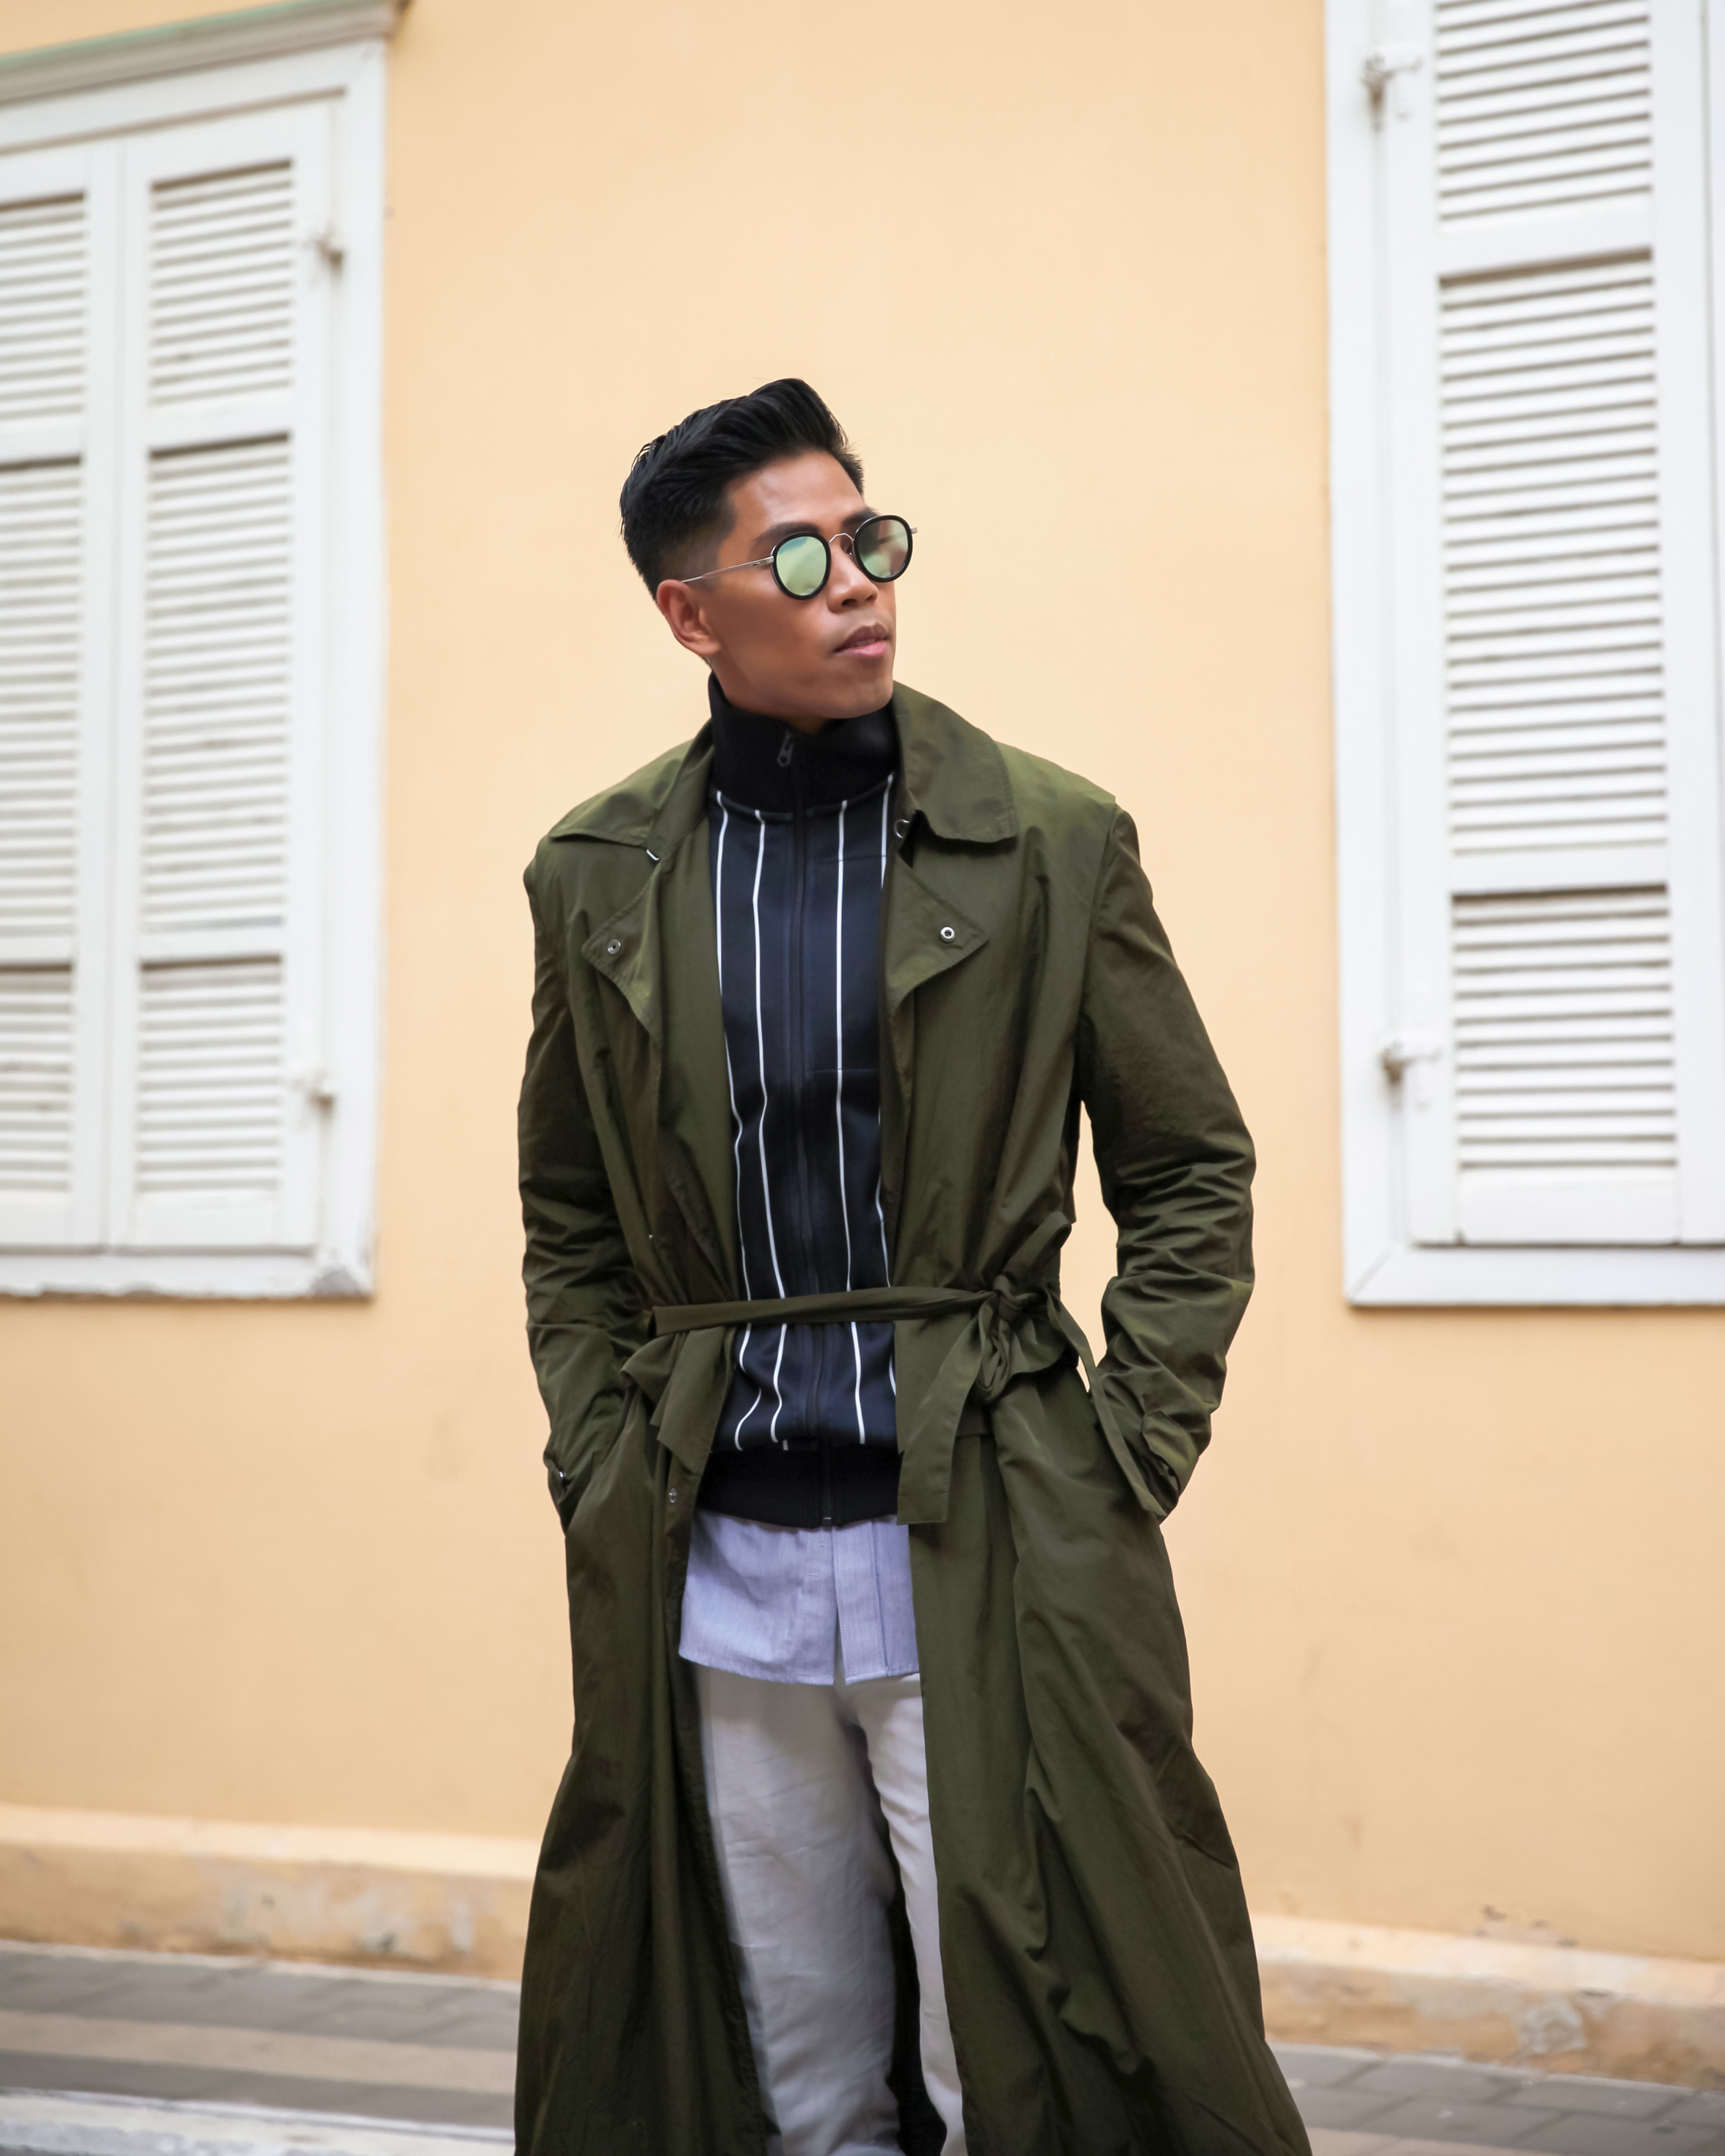 hm studio men ss17 street style blogger